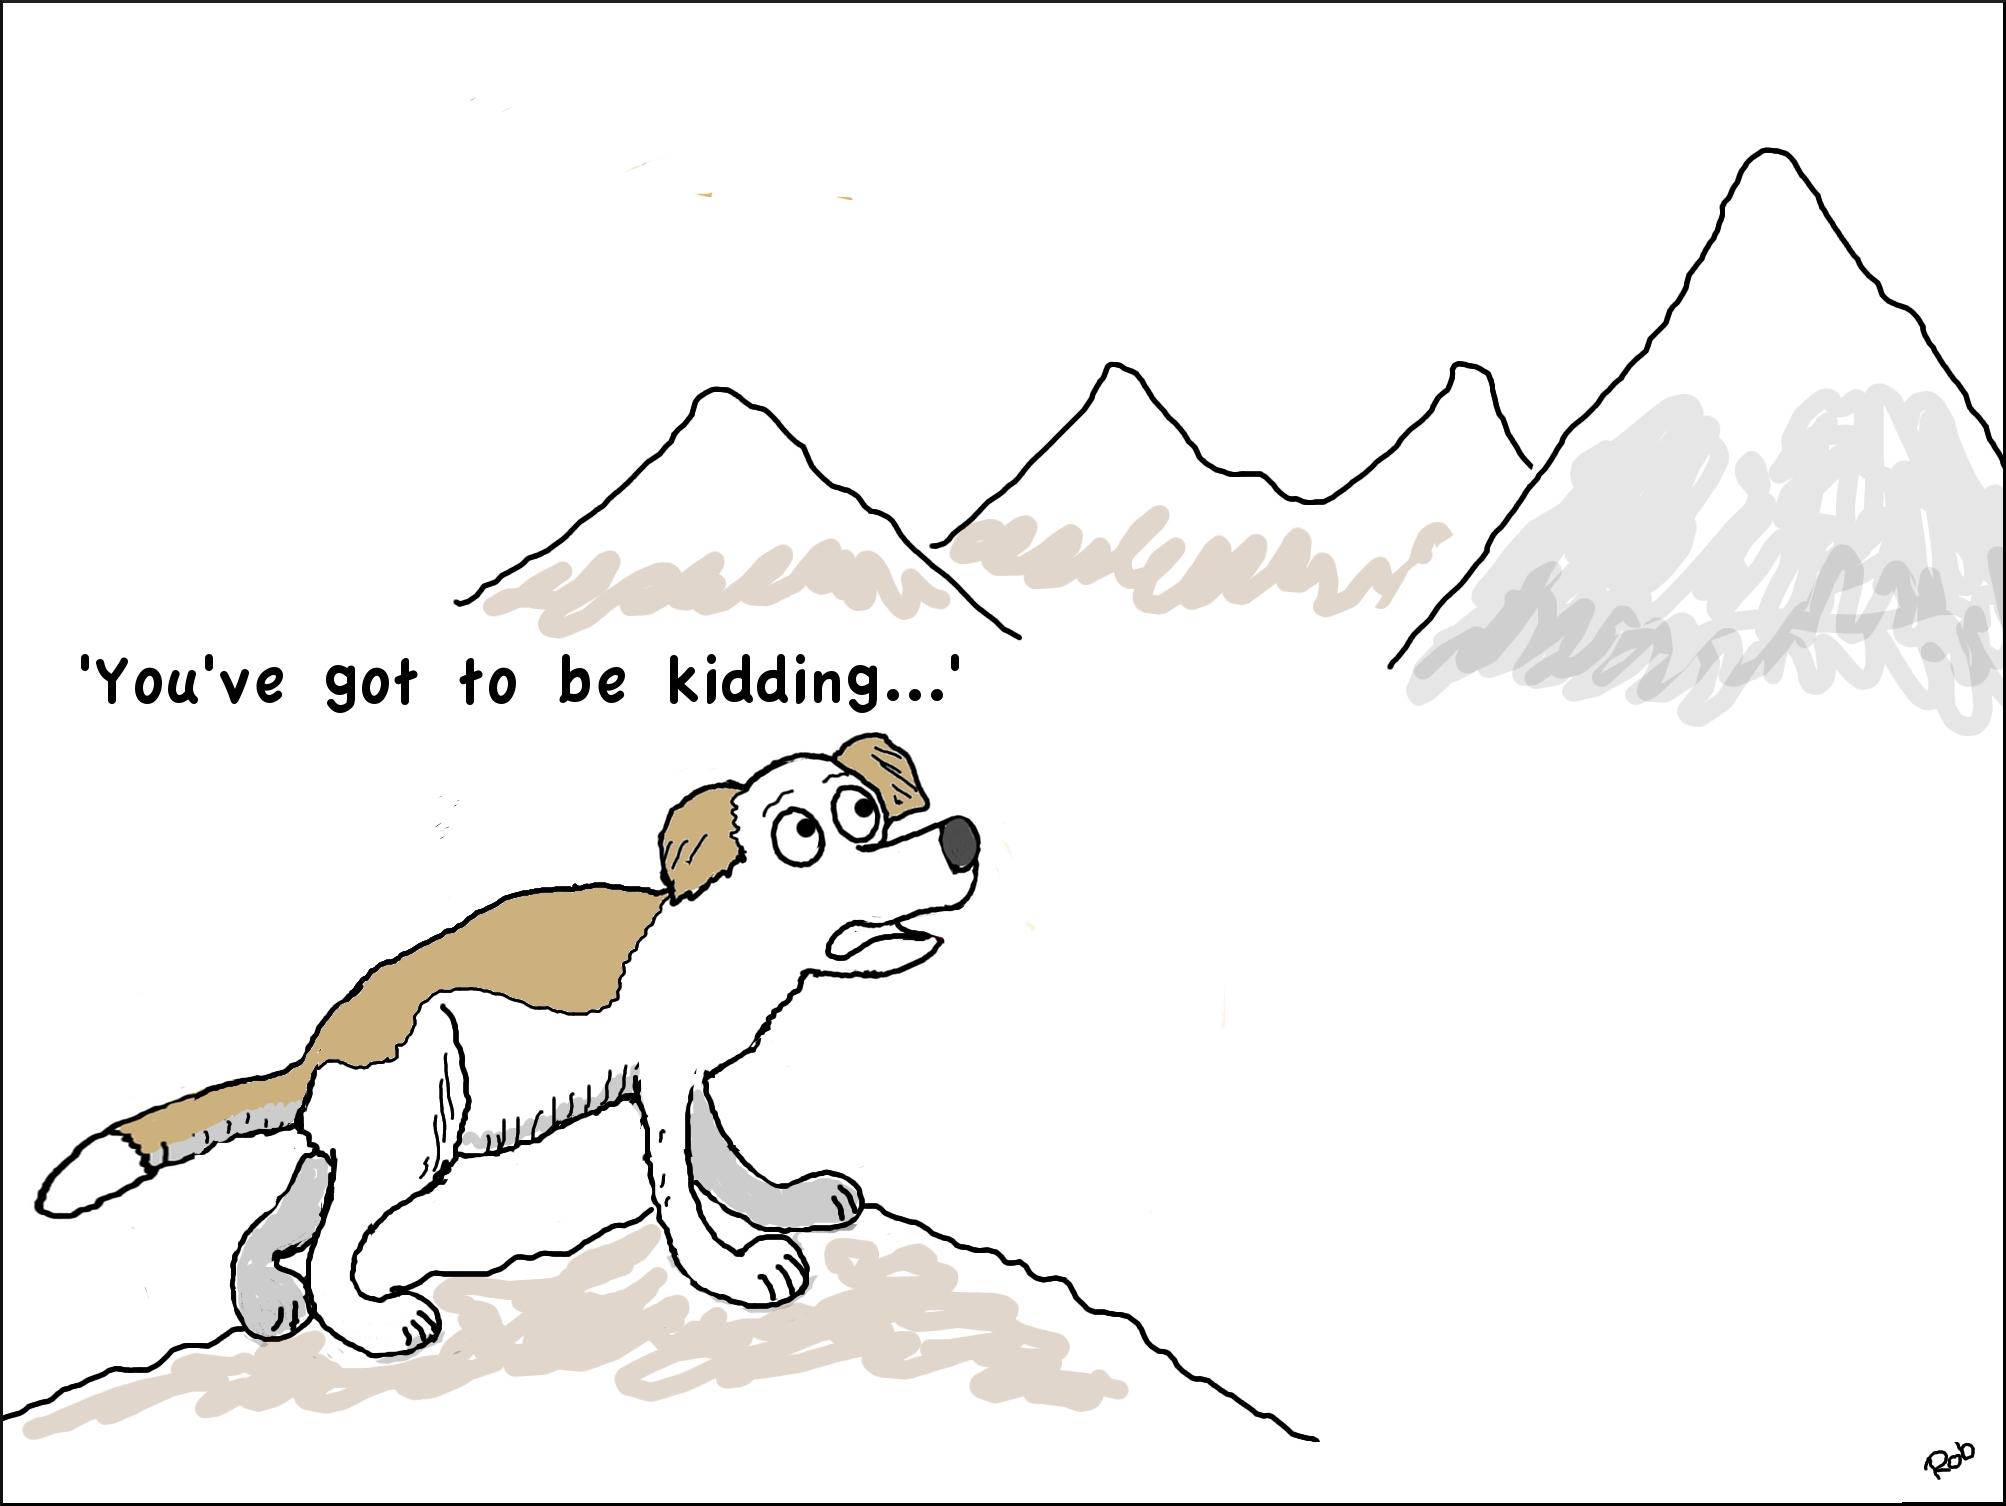 dog-mountain-cartoon